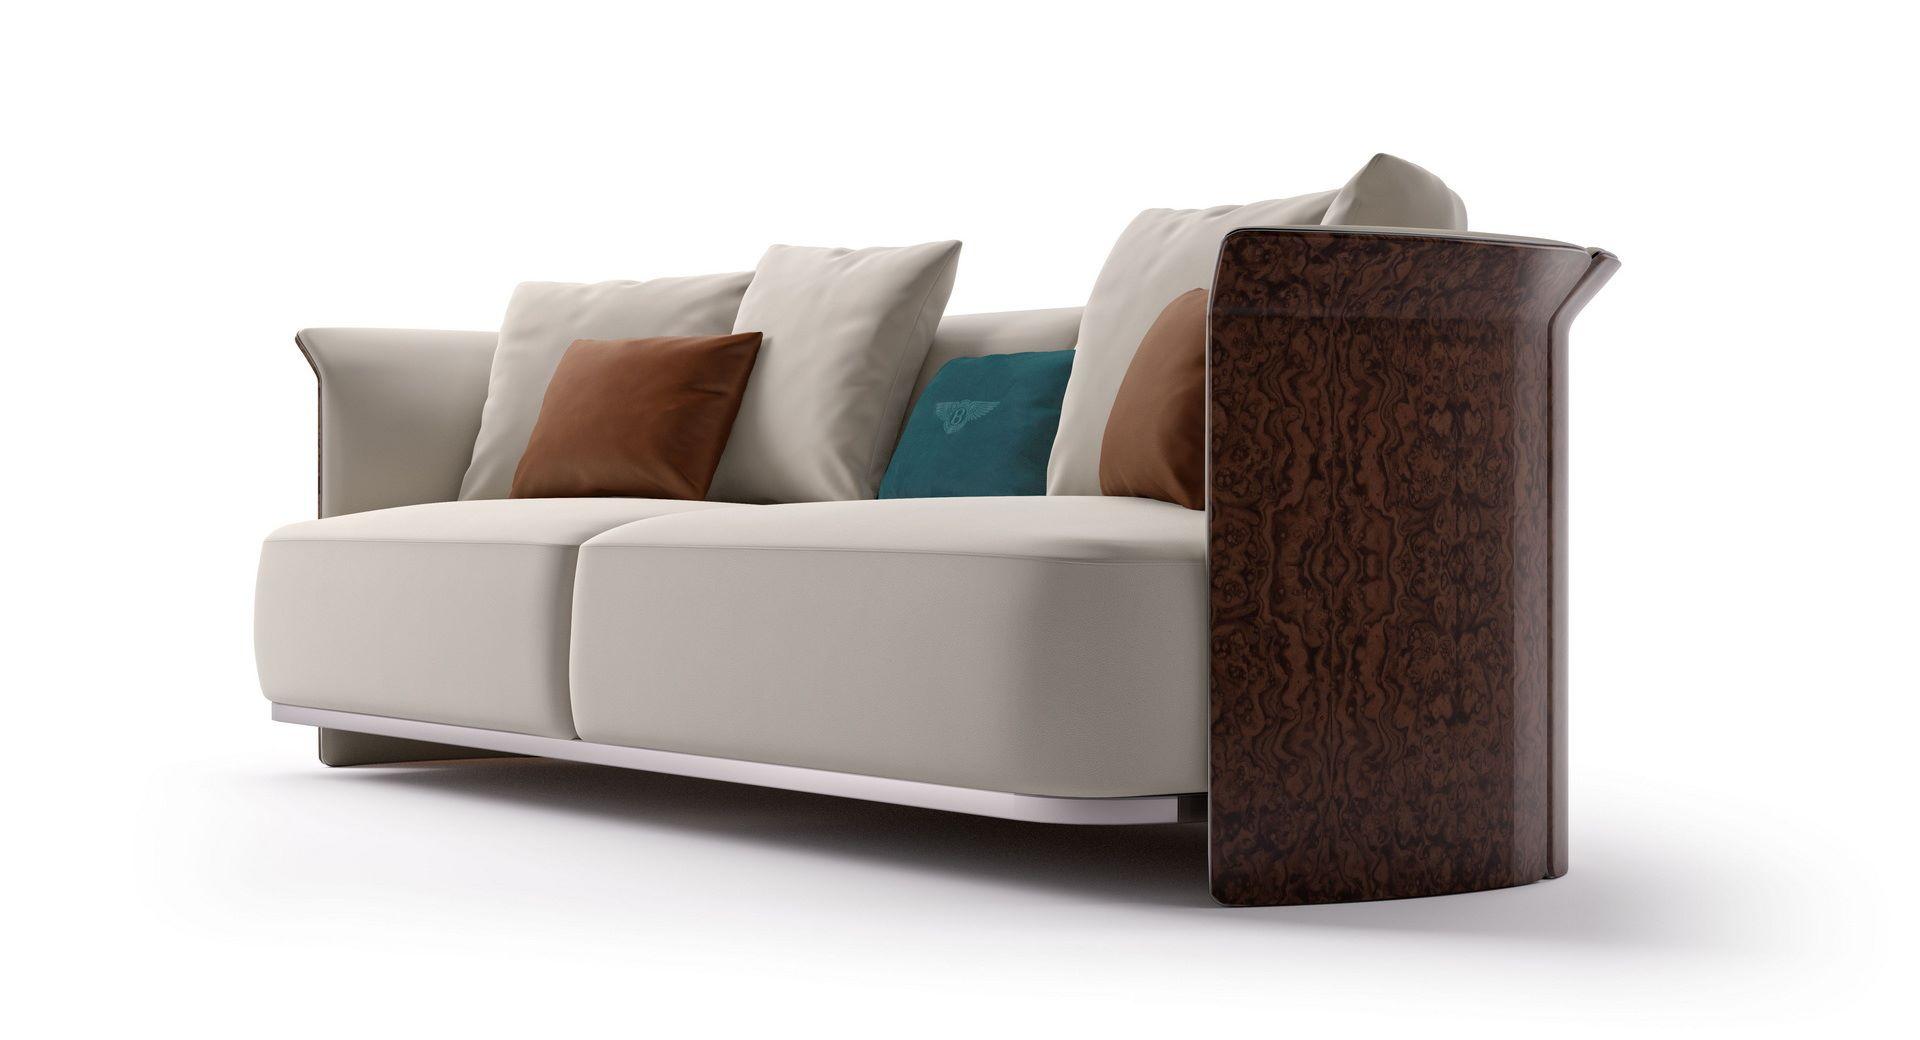 Bentley-Home-Collection-Ramsey-3-seater-sofa-8_2